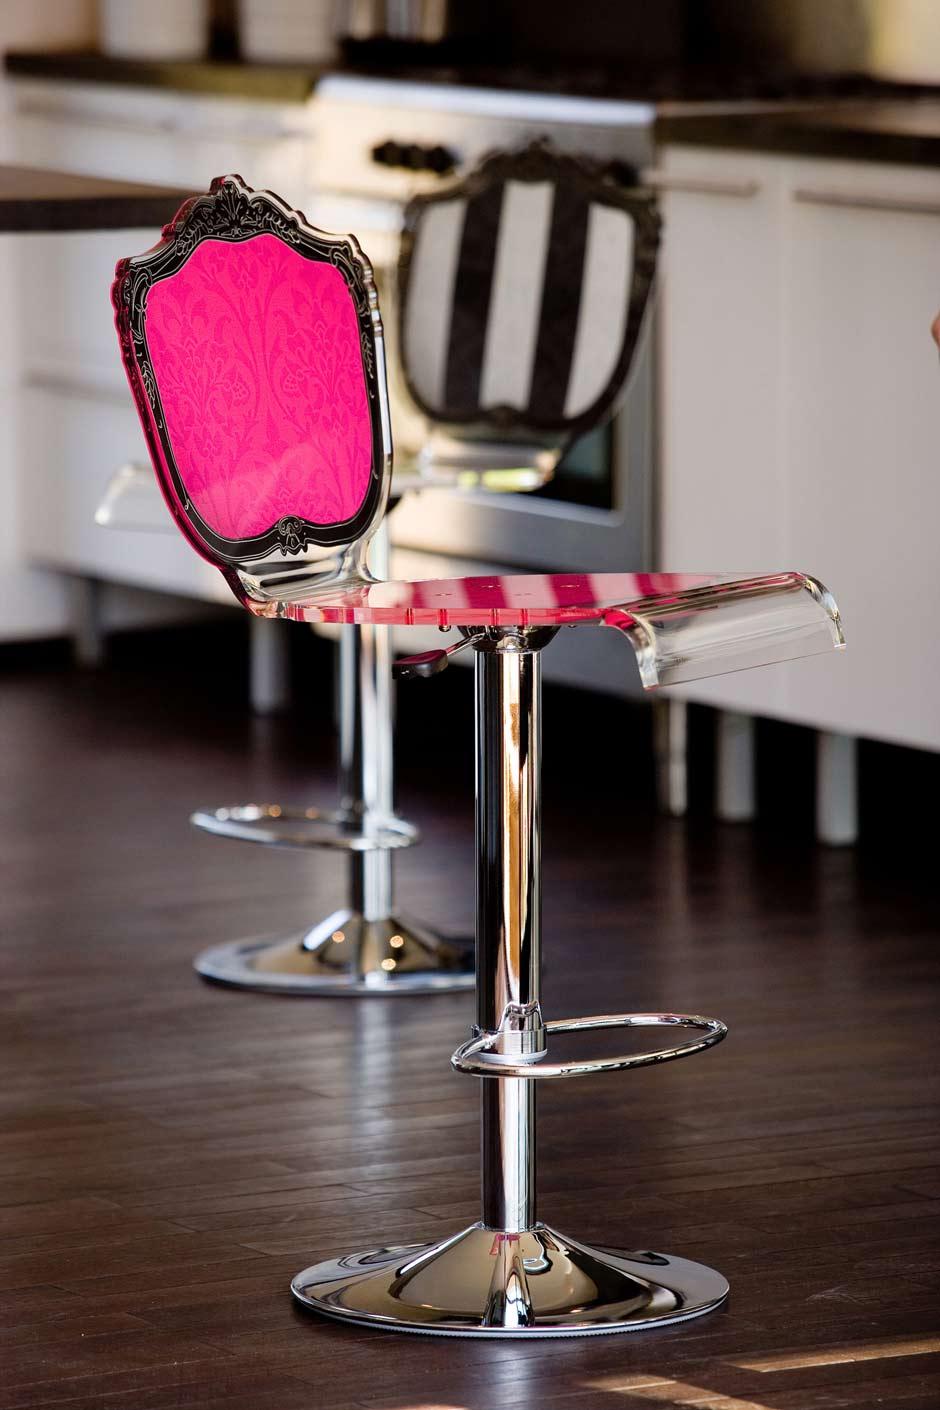 tabouret baroque plexiglas motif rose fuchsia acrila sp cialiste du plexiglas r f 11030366. Black Bedroom Furniture Sets. Home Design Ideas